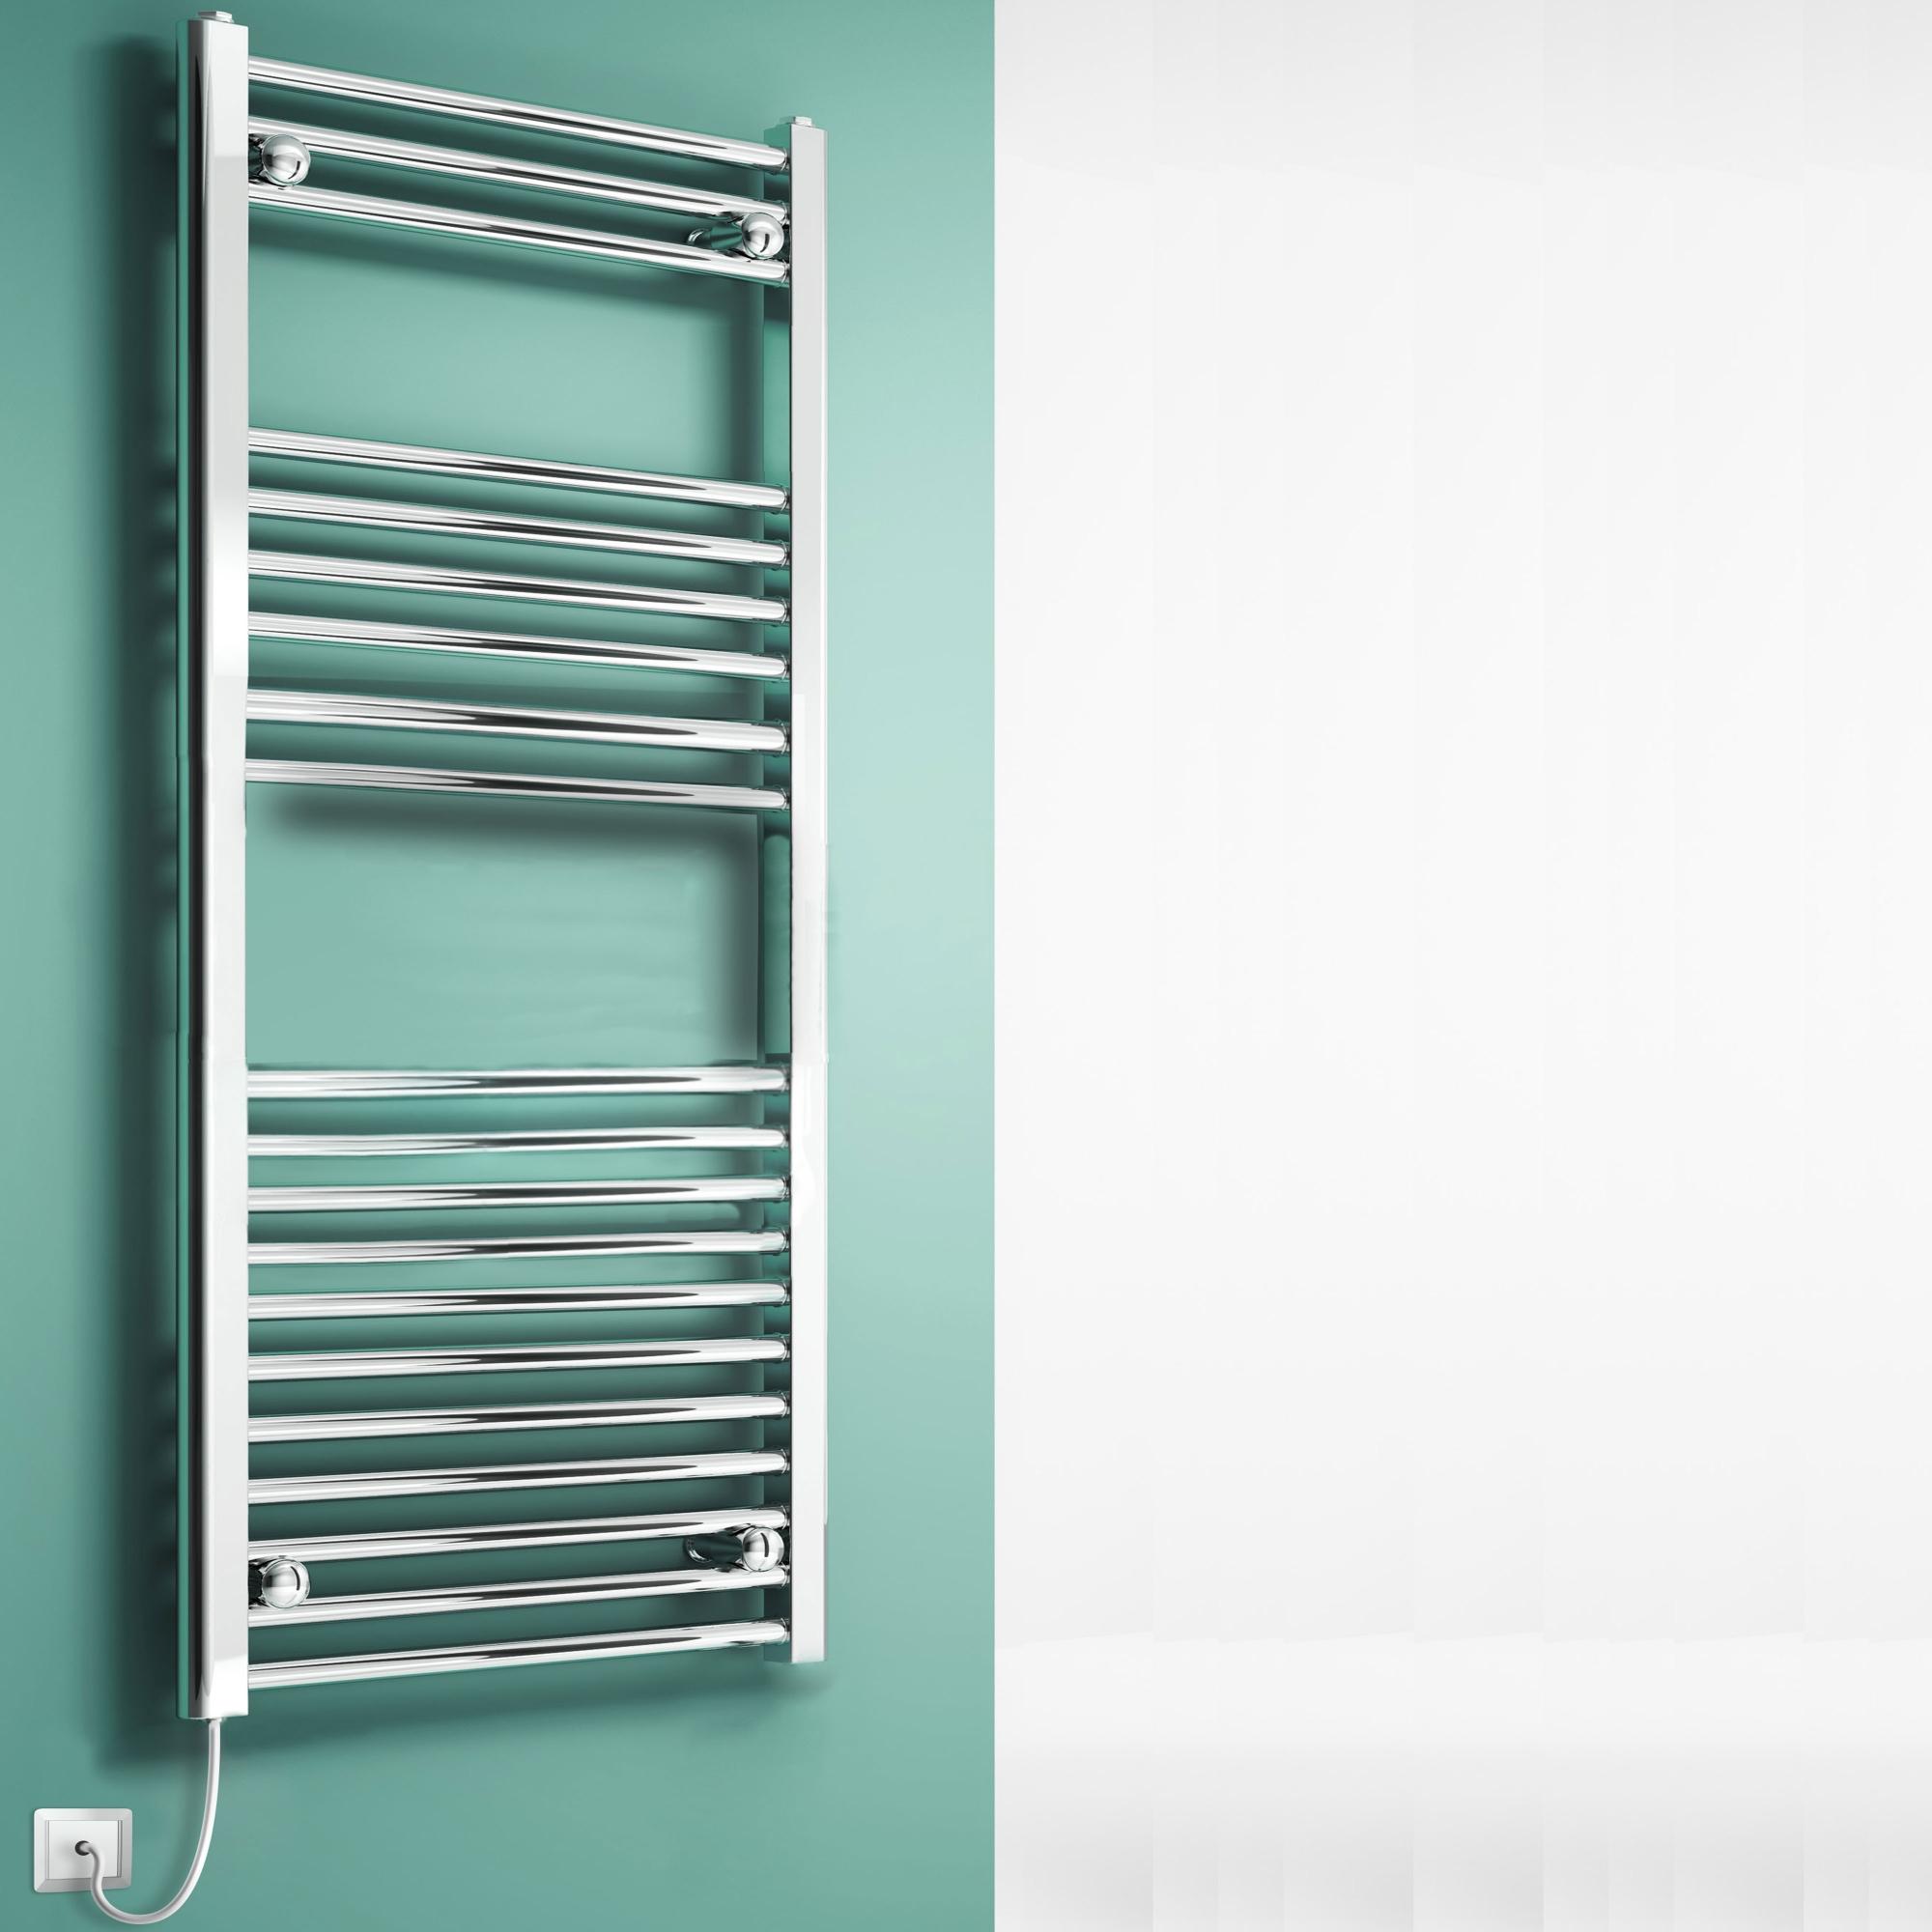 Reina Eross Dry Electric Heated Towel Rail 1100mm H x 600mm W